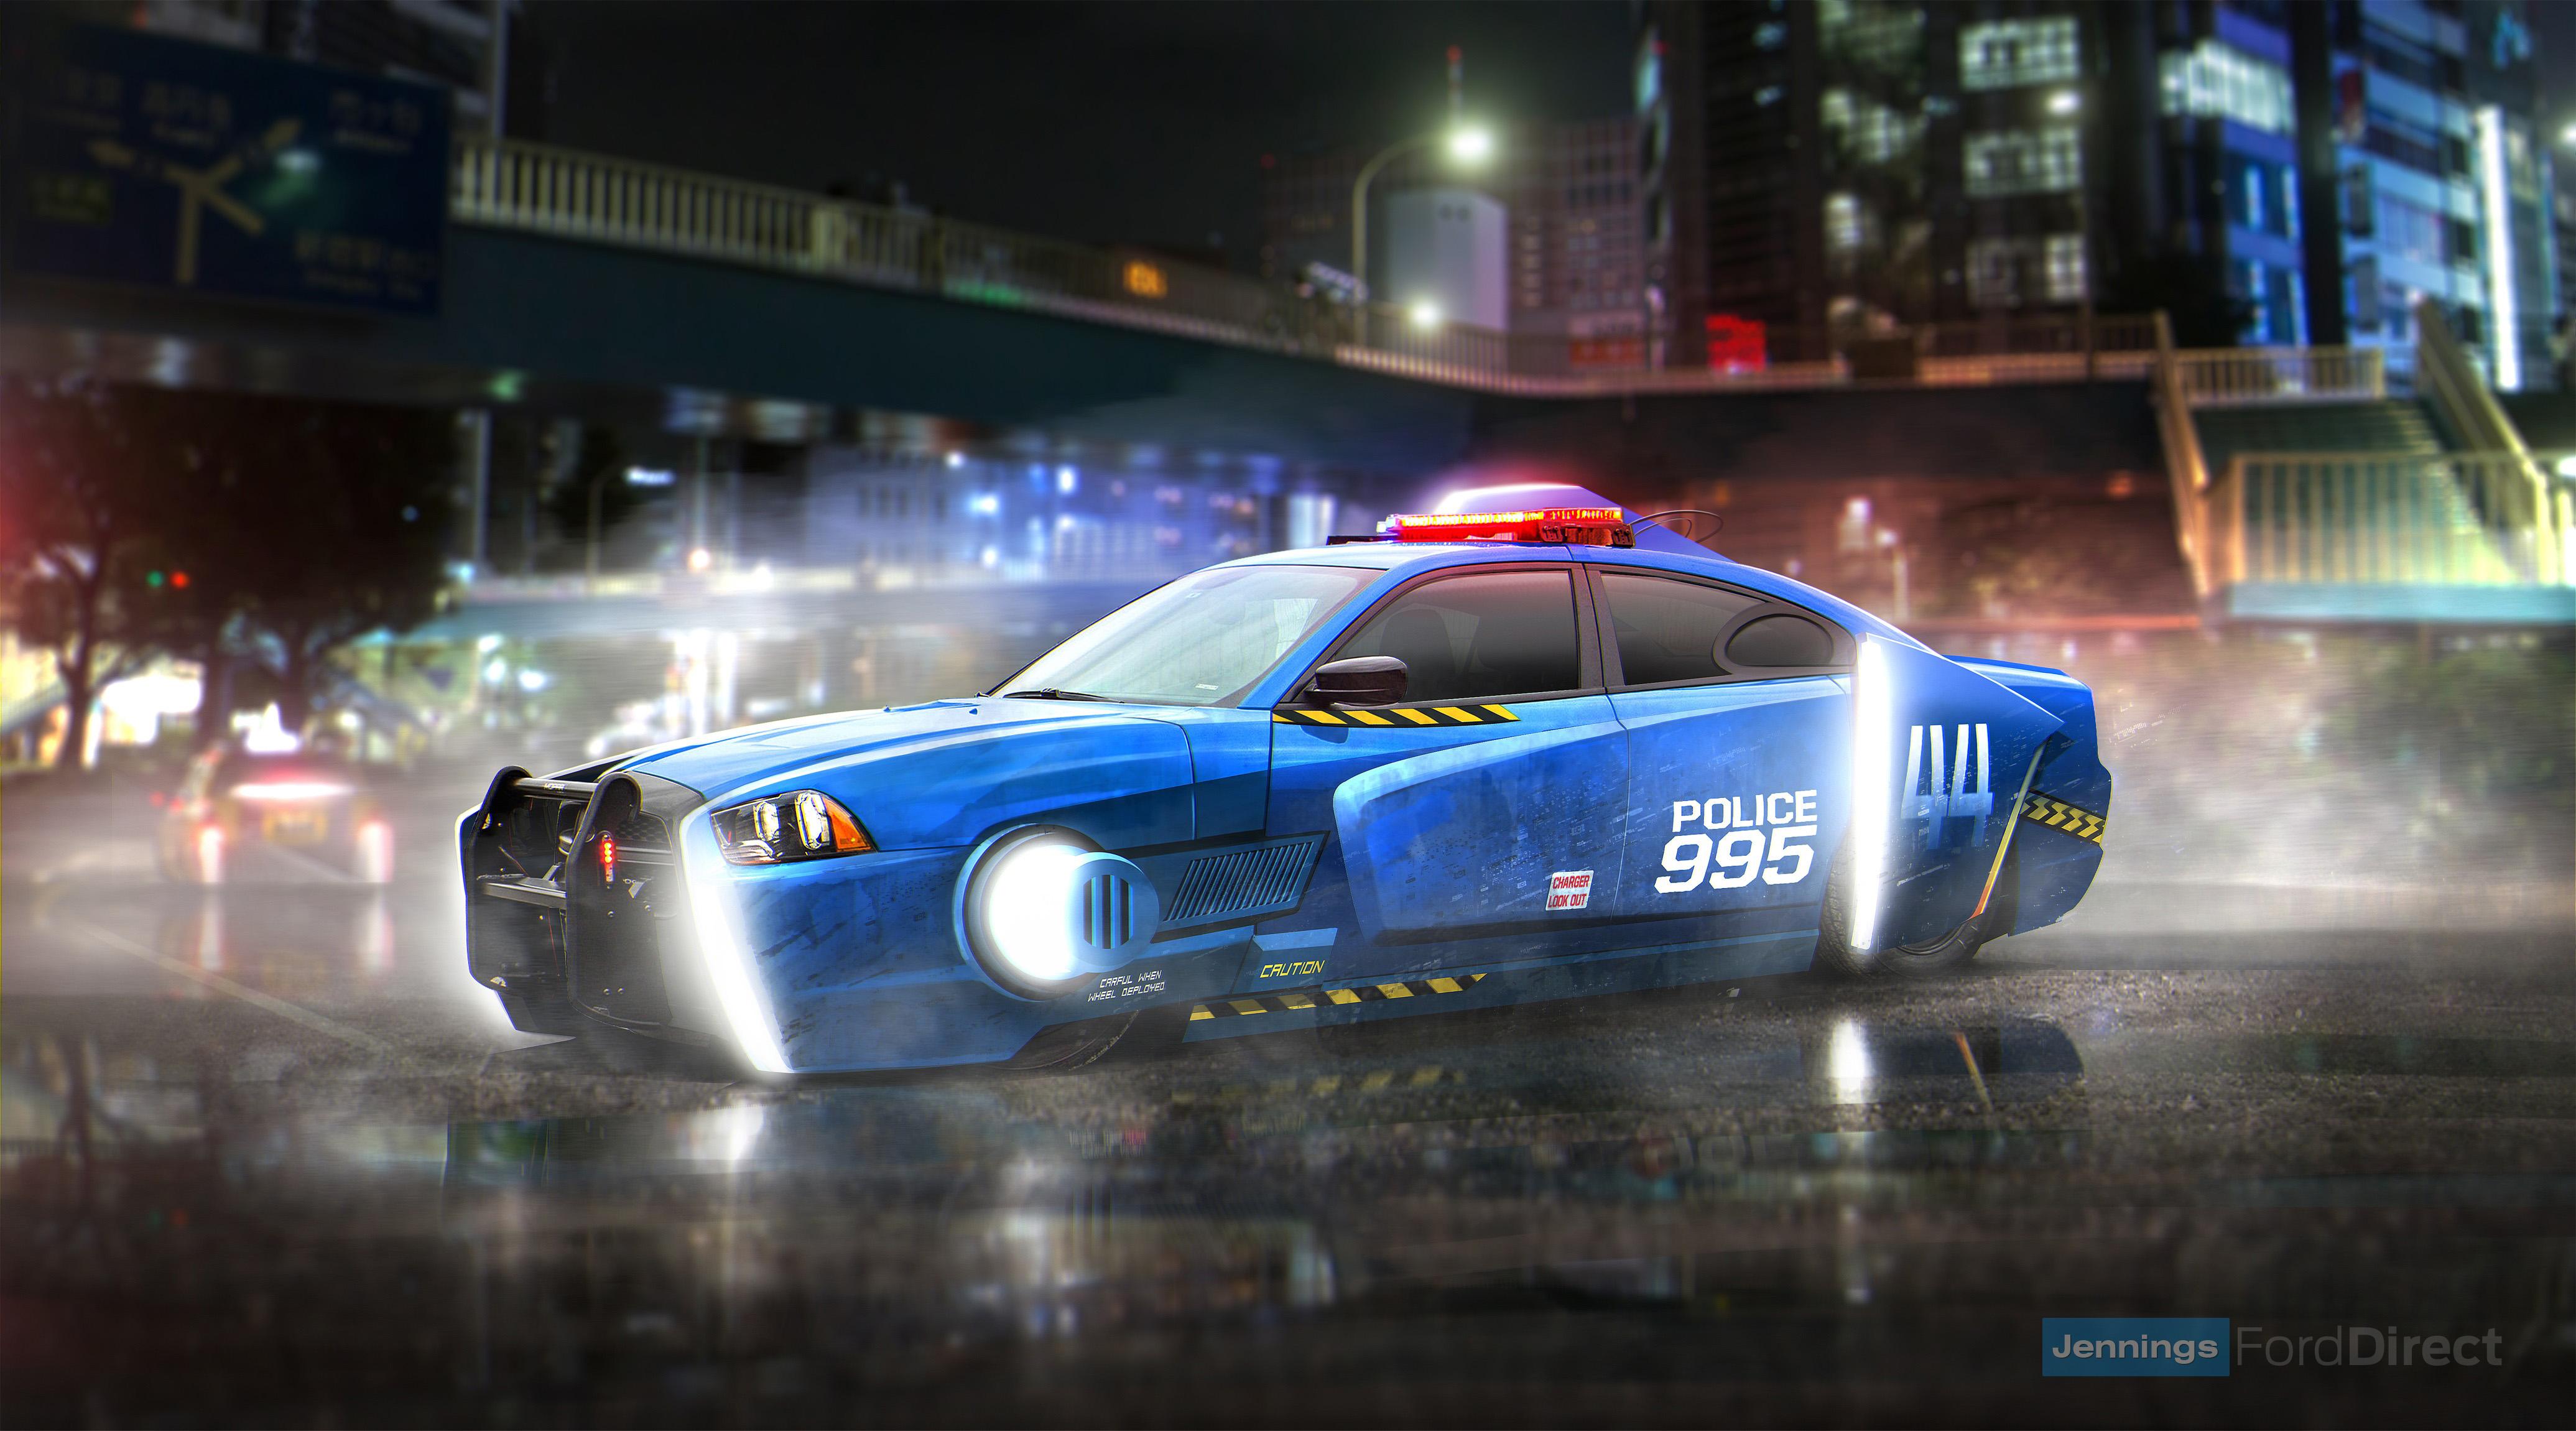 Blade Runner Spinner Dodge Charger Police Car Hd Cars 4k